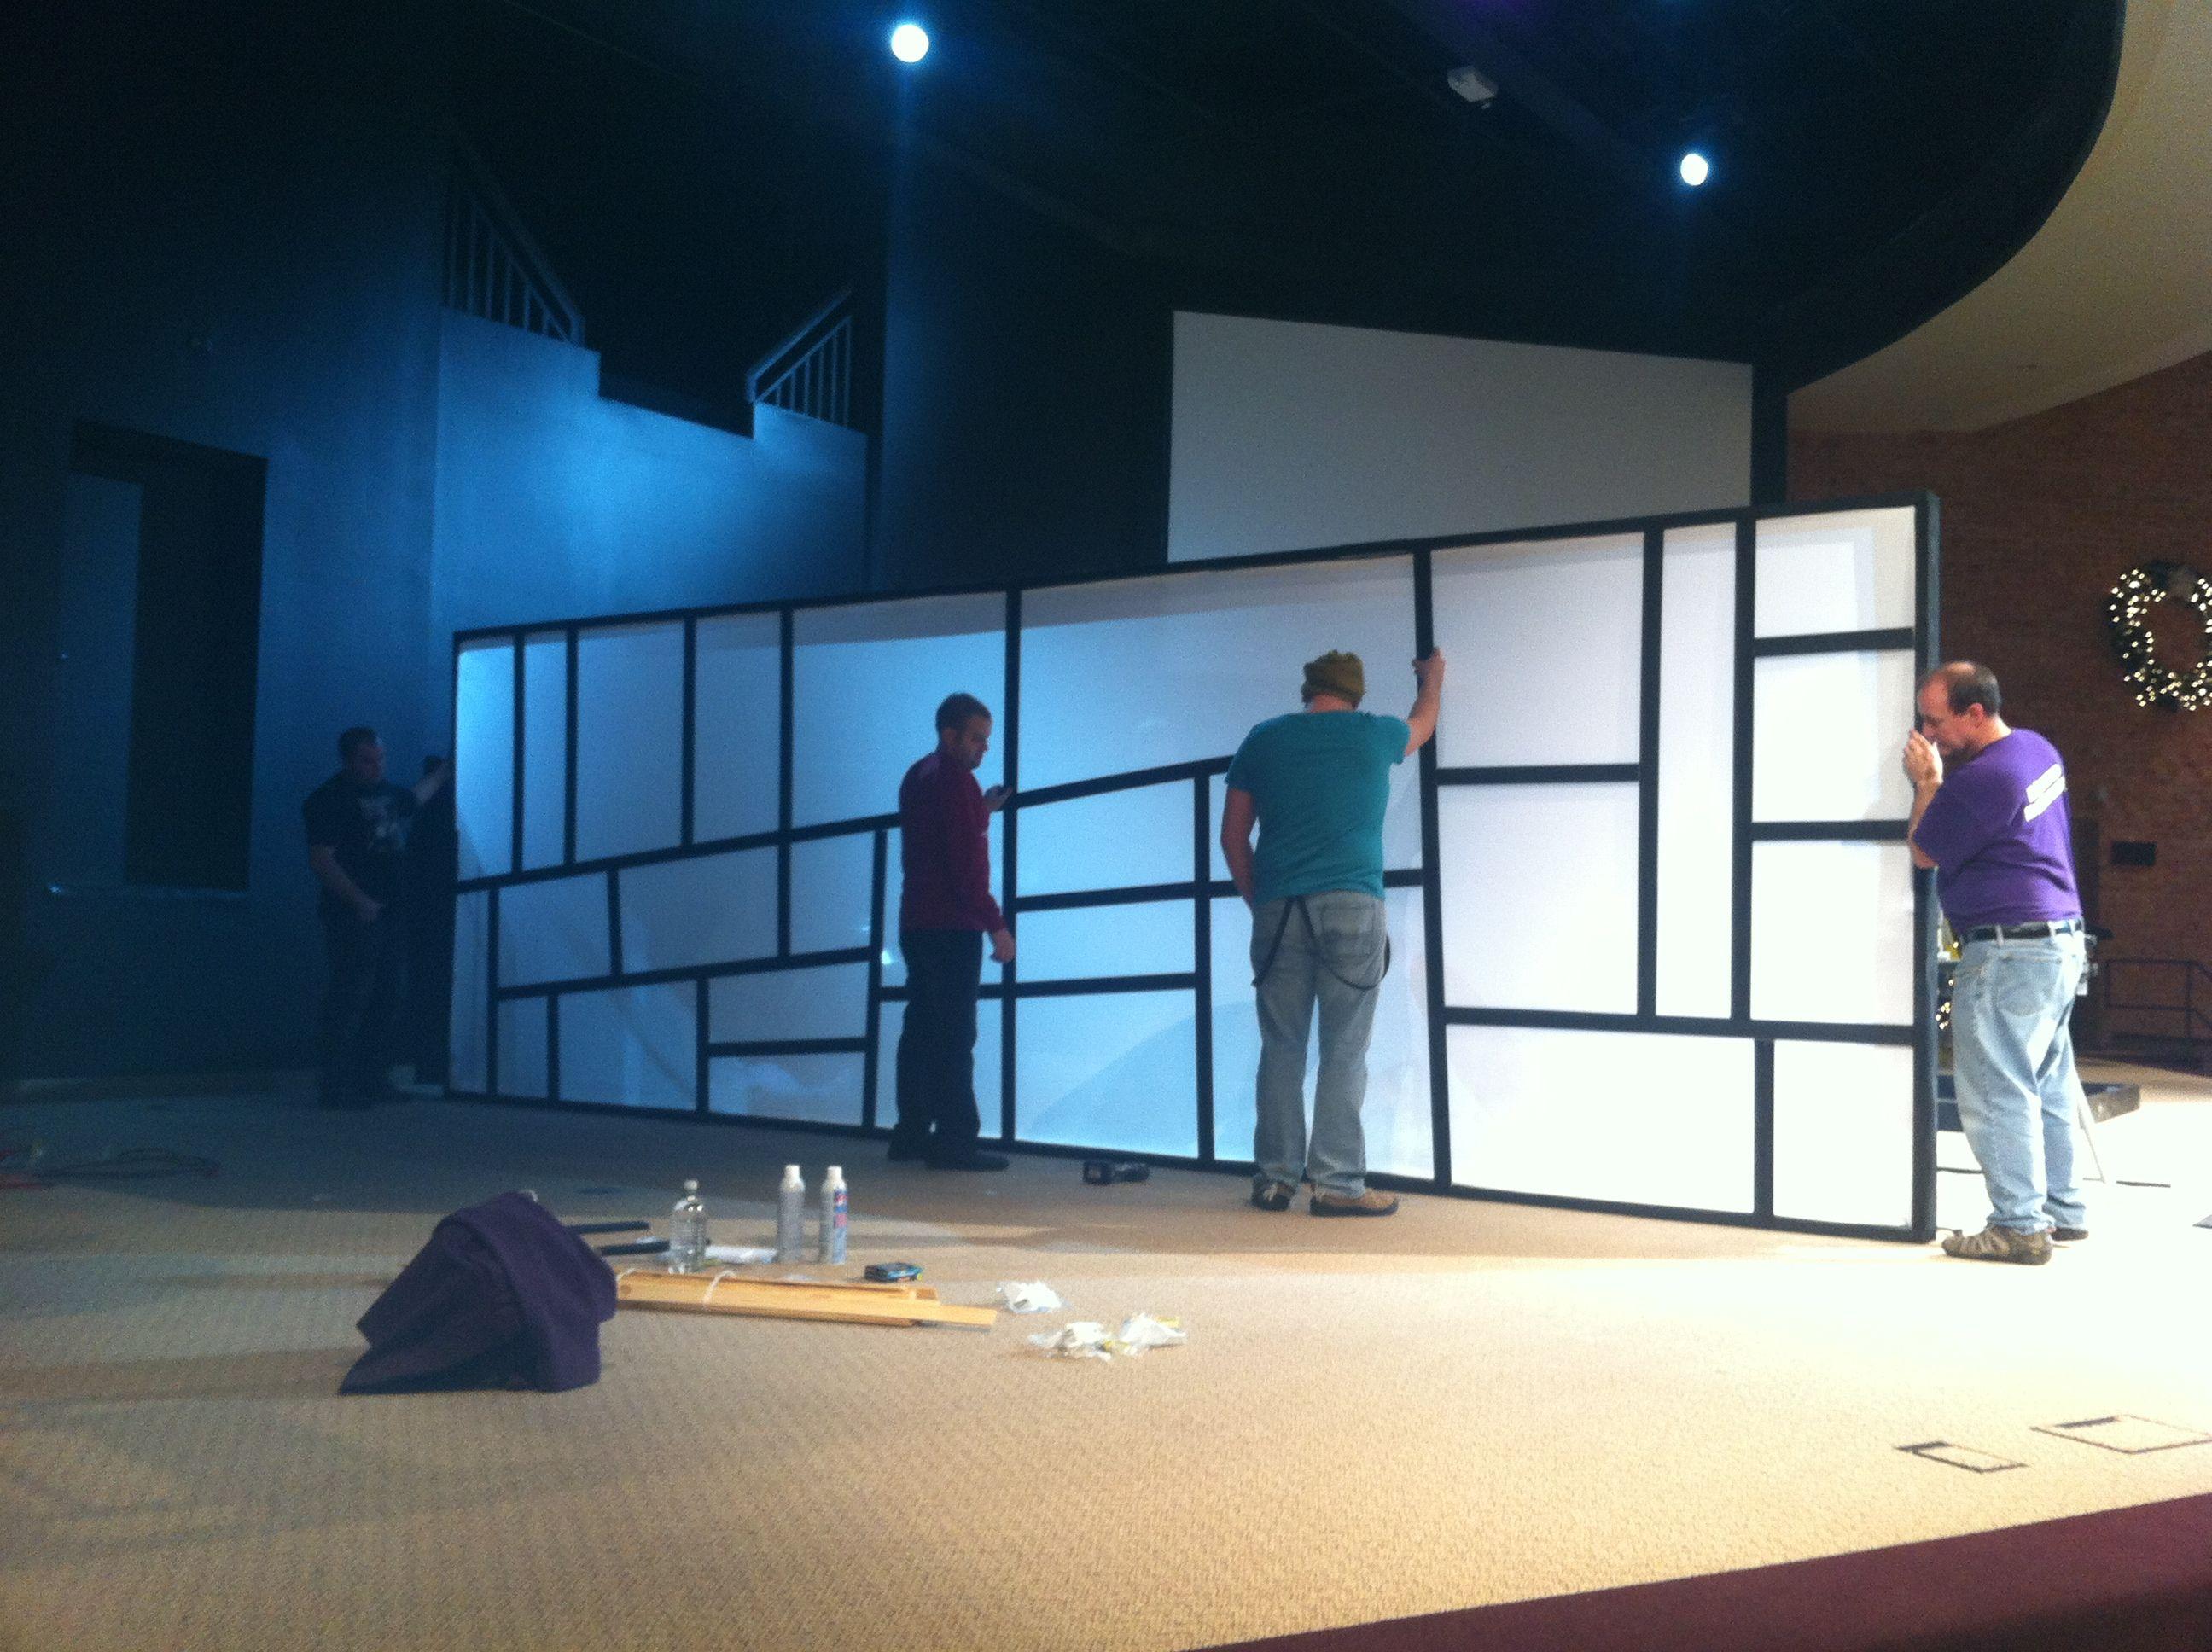 stage design   Stage design, Stage and Church stage